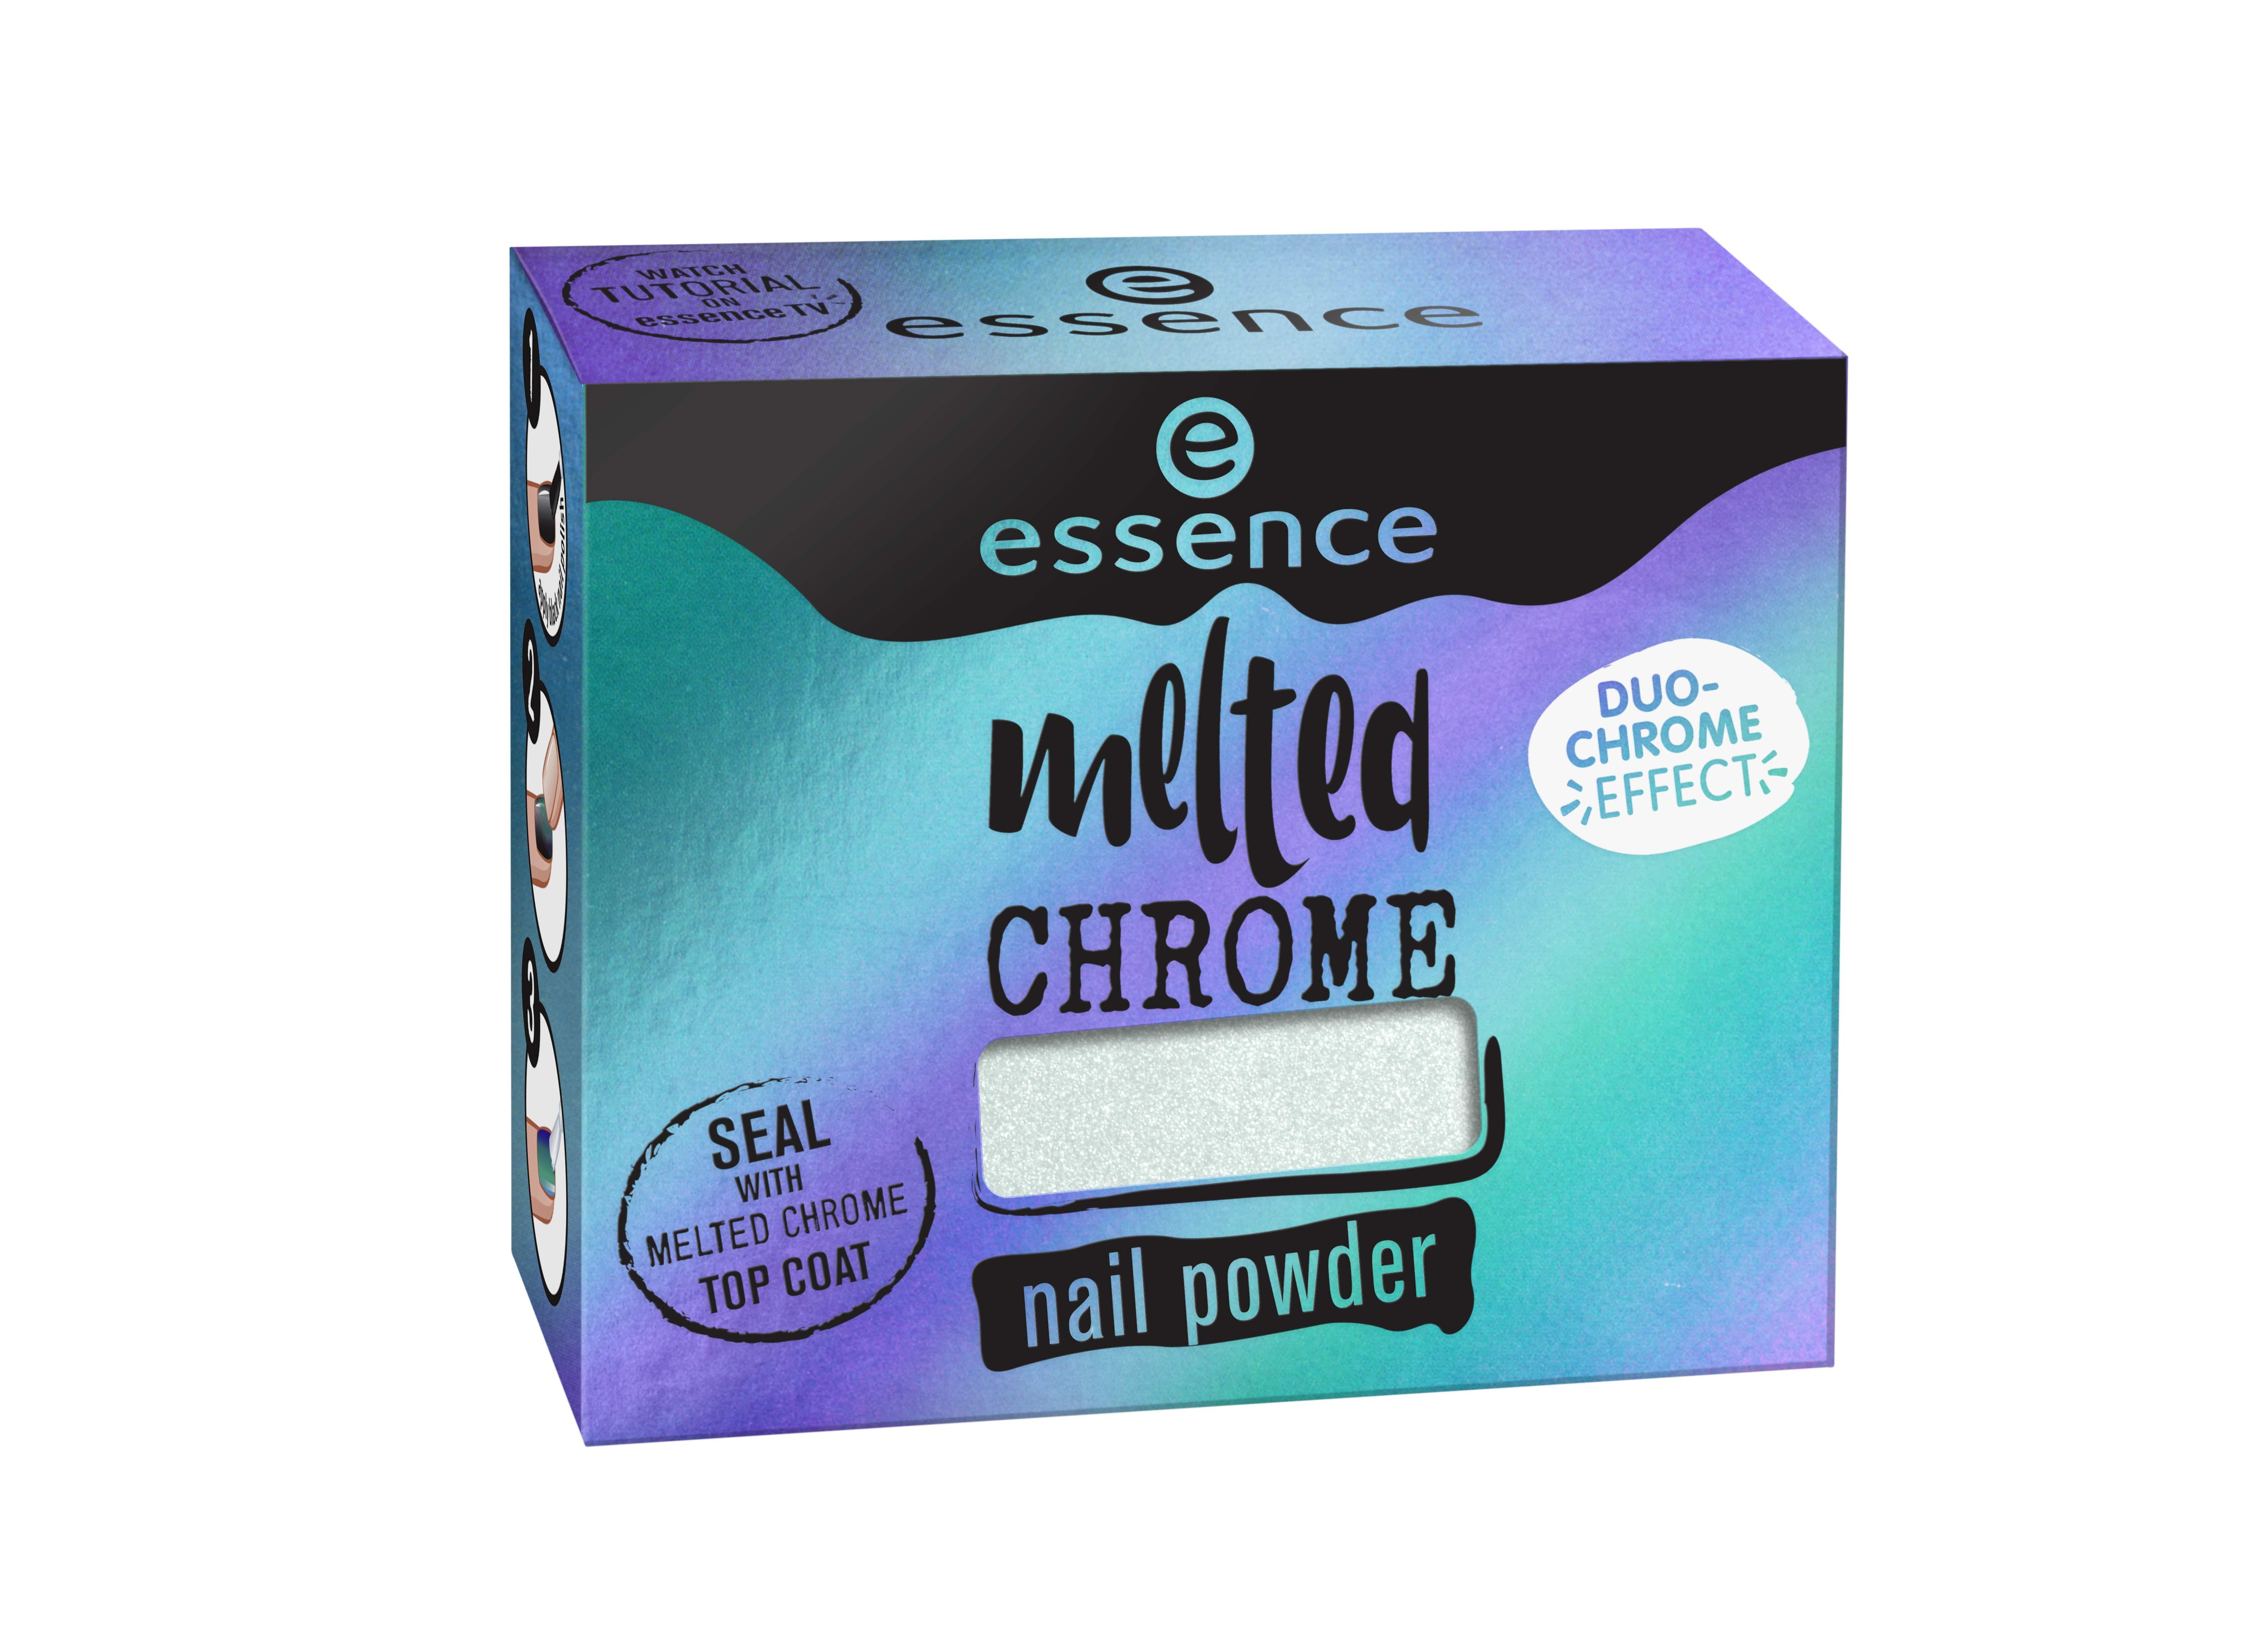 essence-melted-chrome-nail-powder-e3-80